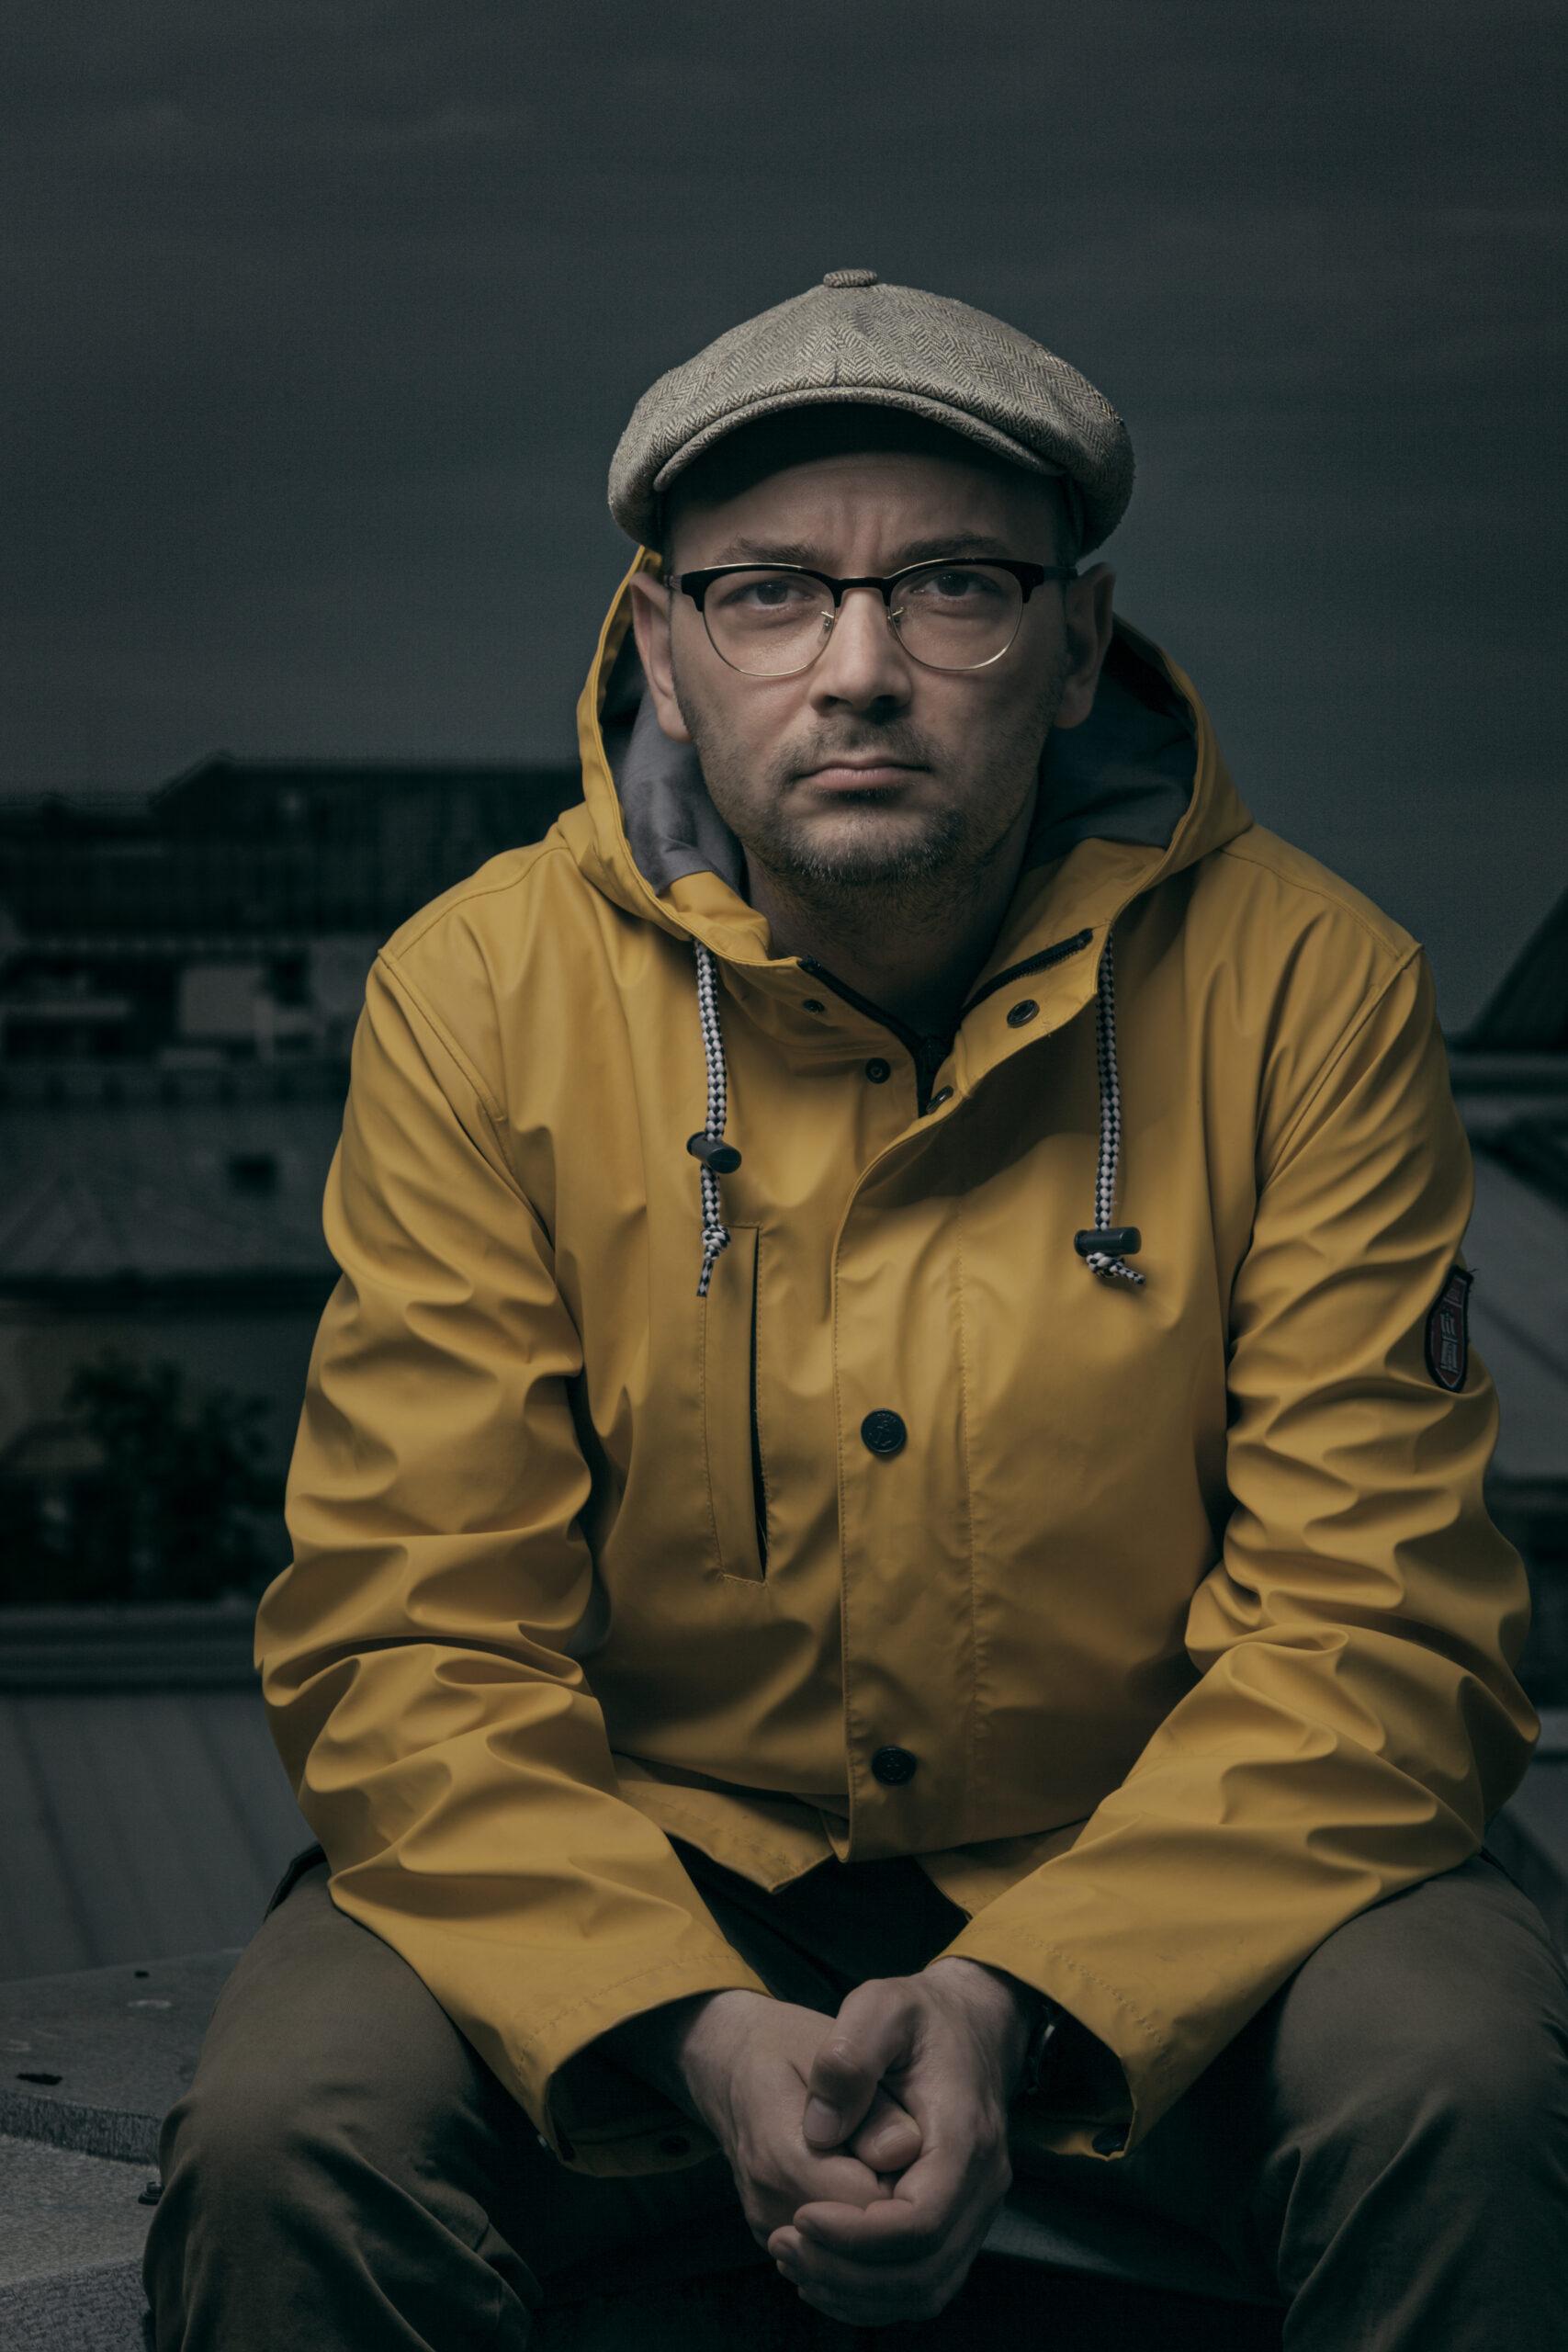 Filip Springer nominowany do Nagrody im. Norwida w kategorii literatura 2020